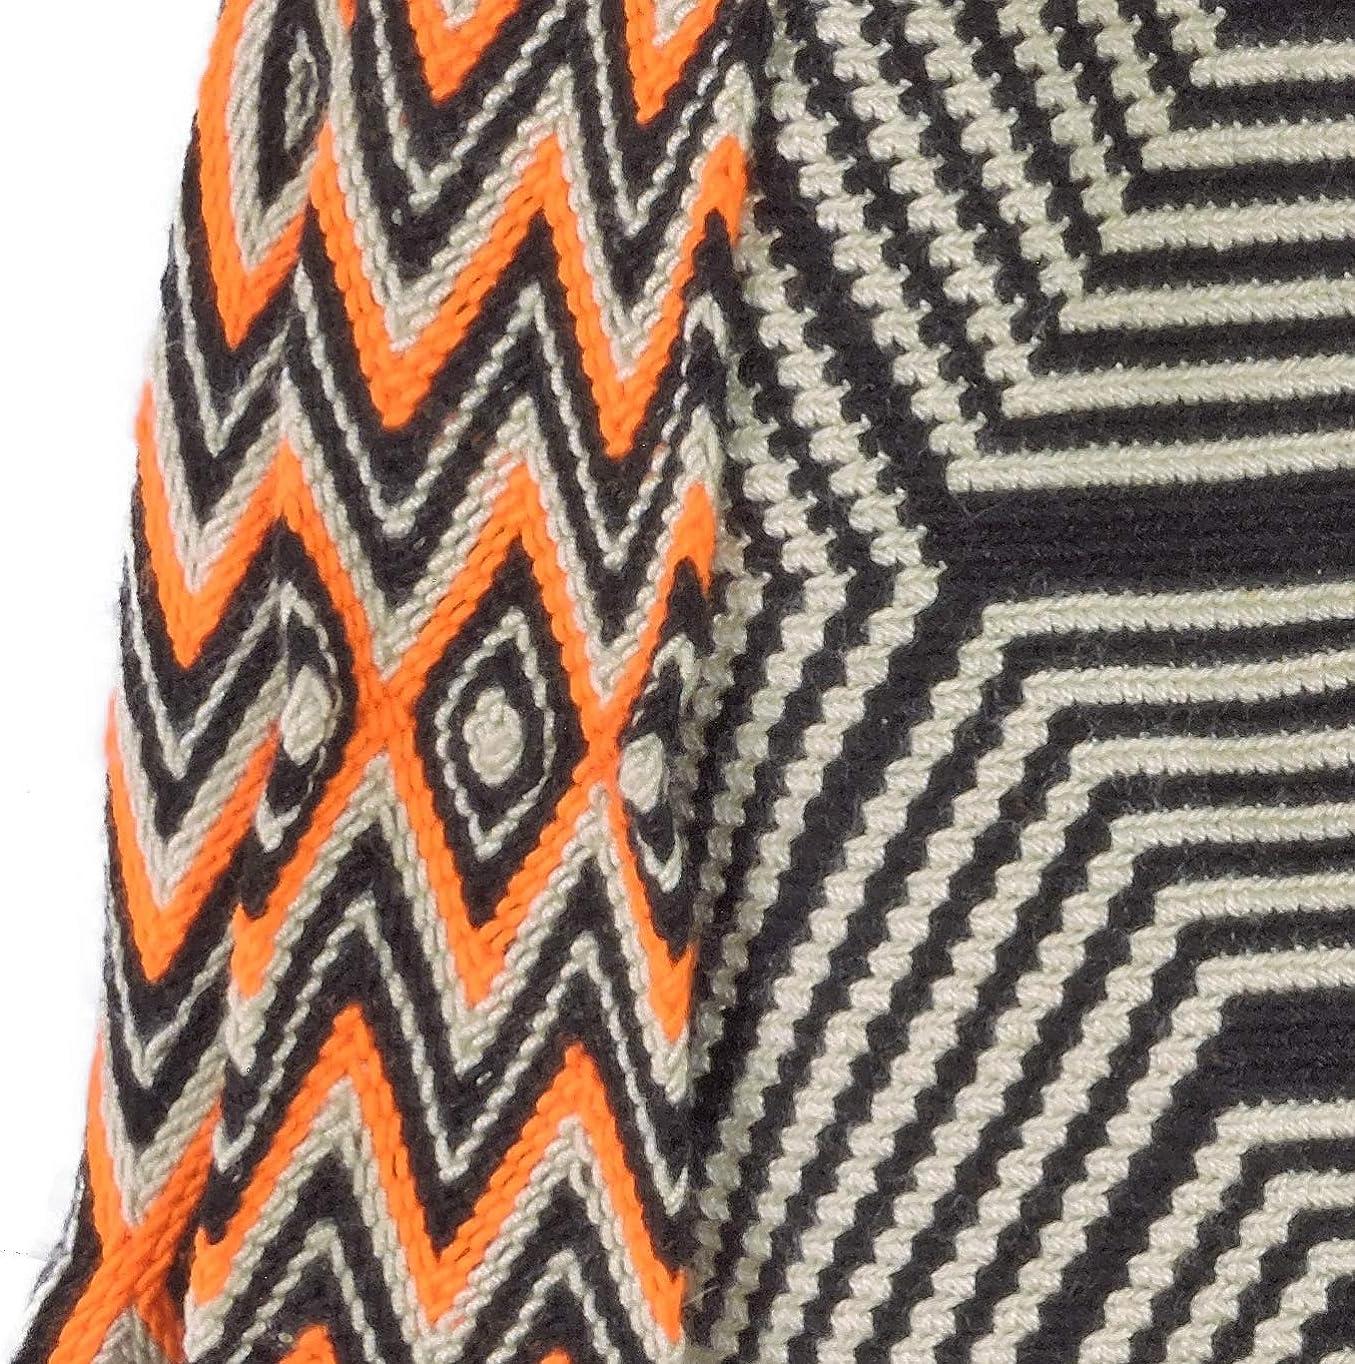 Amazon.com: Wayuu Mochila Bolsas de ganchillo tejidas a mano ...